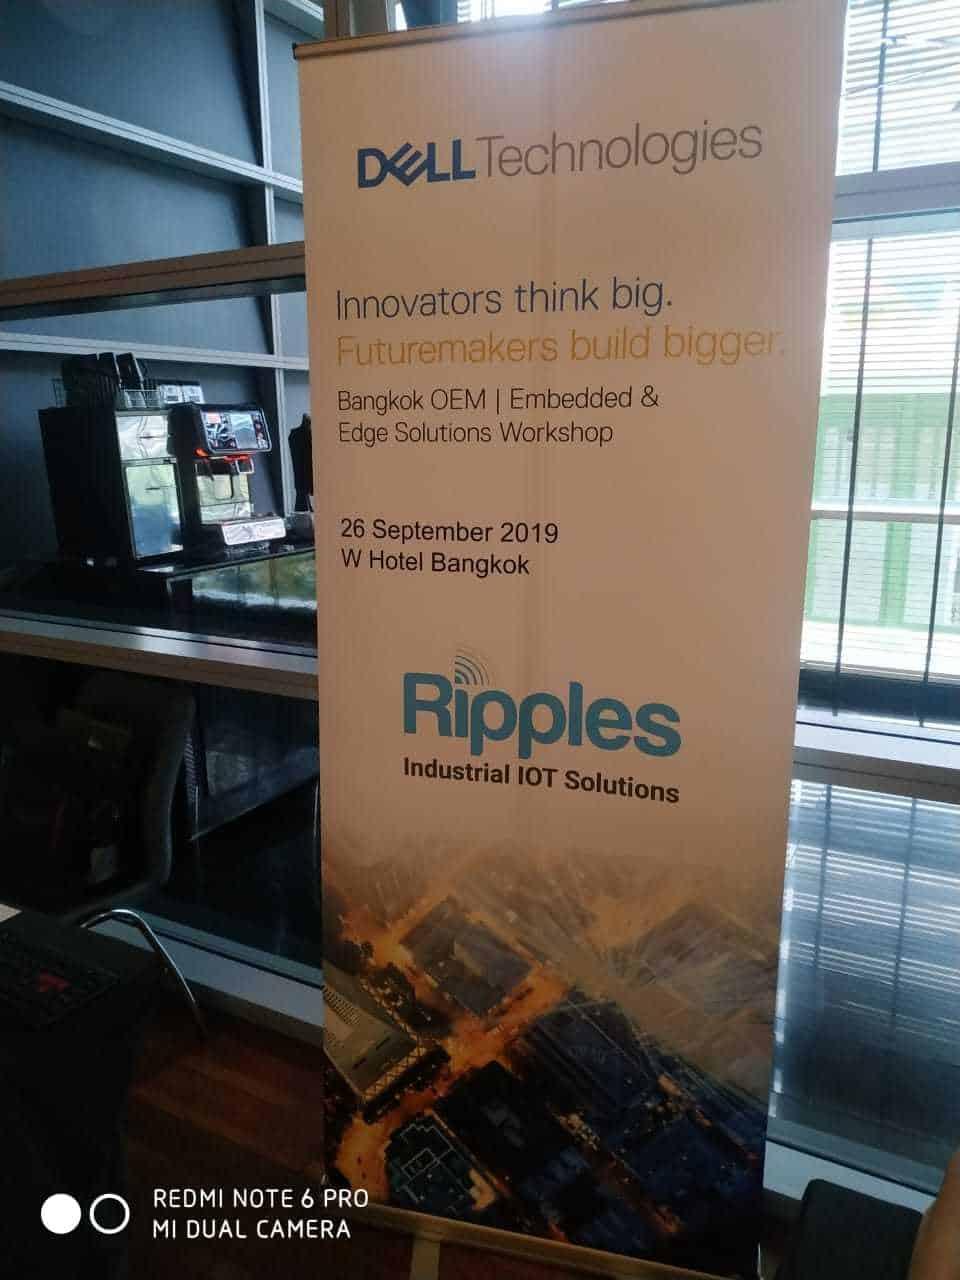 Dell EMC - hospital indoor positioning, asset tracking, environment monitoring solutions